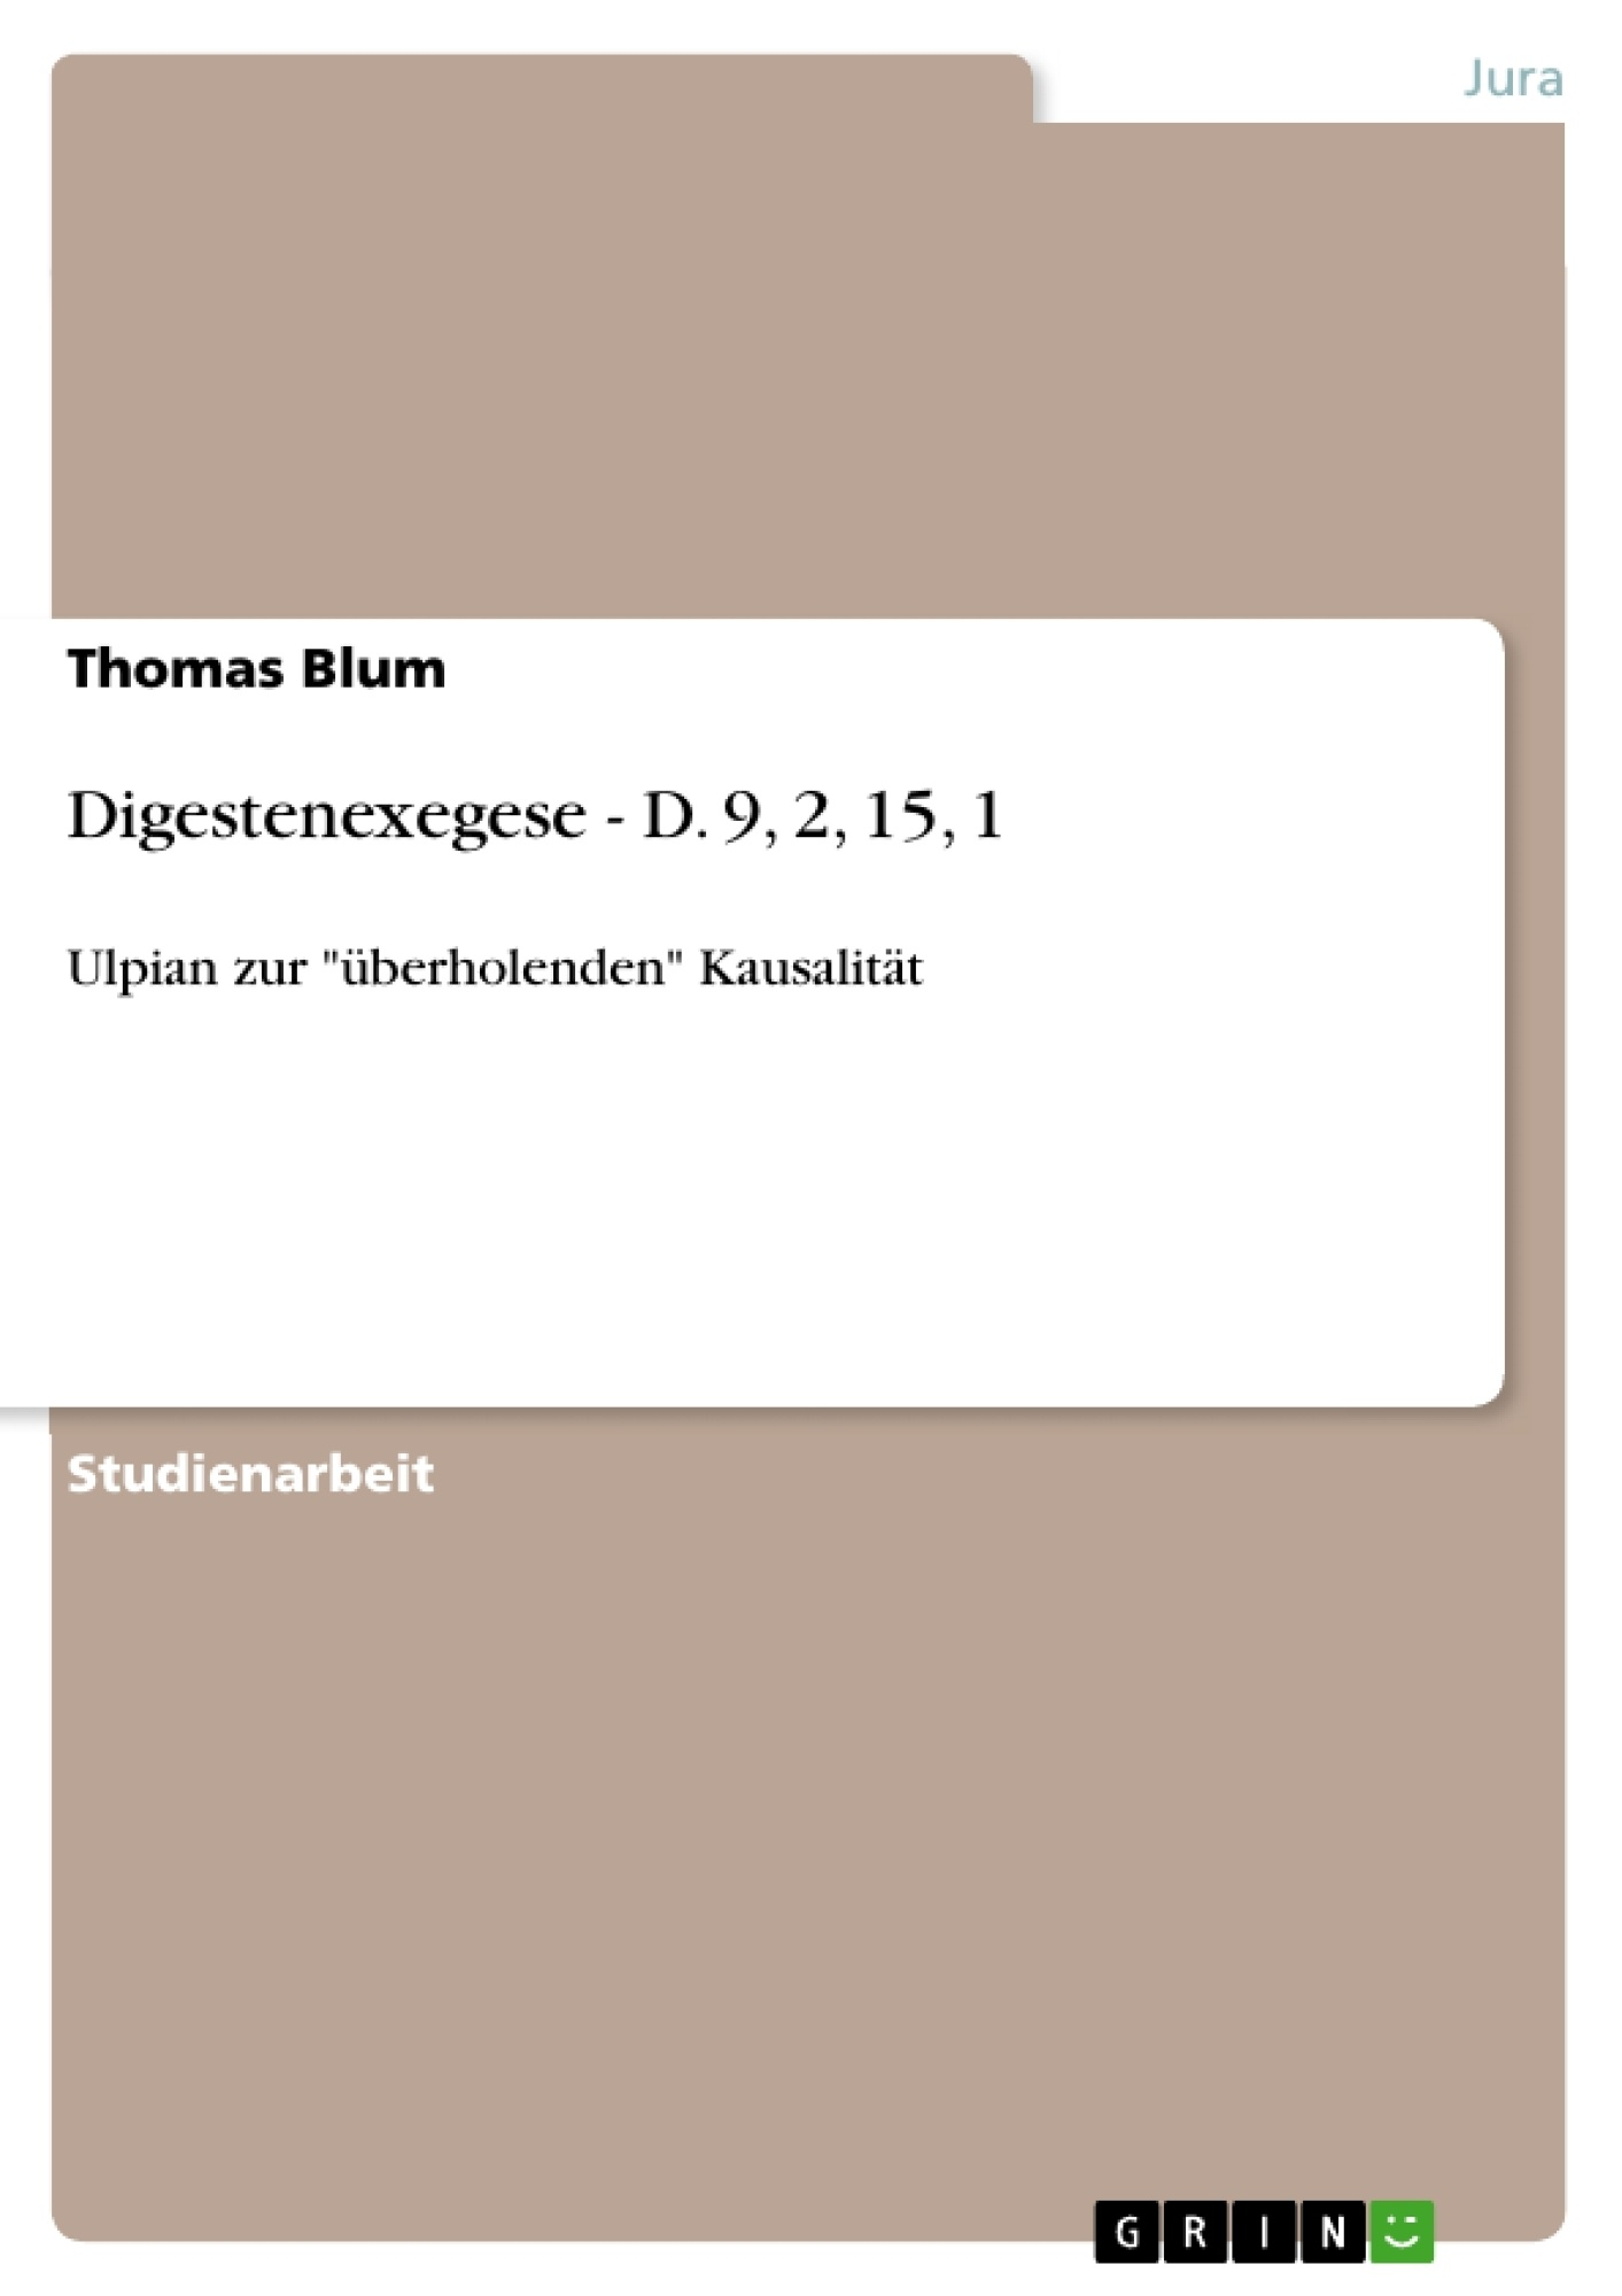 Titel: Digestenexegese - D. 9, 2, 15, 1